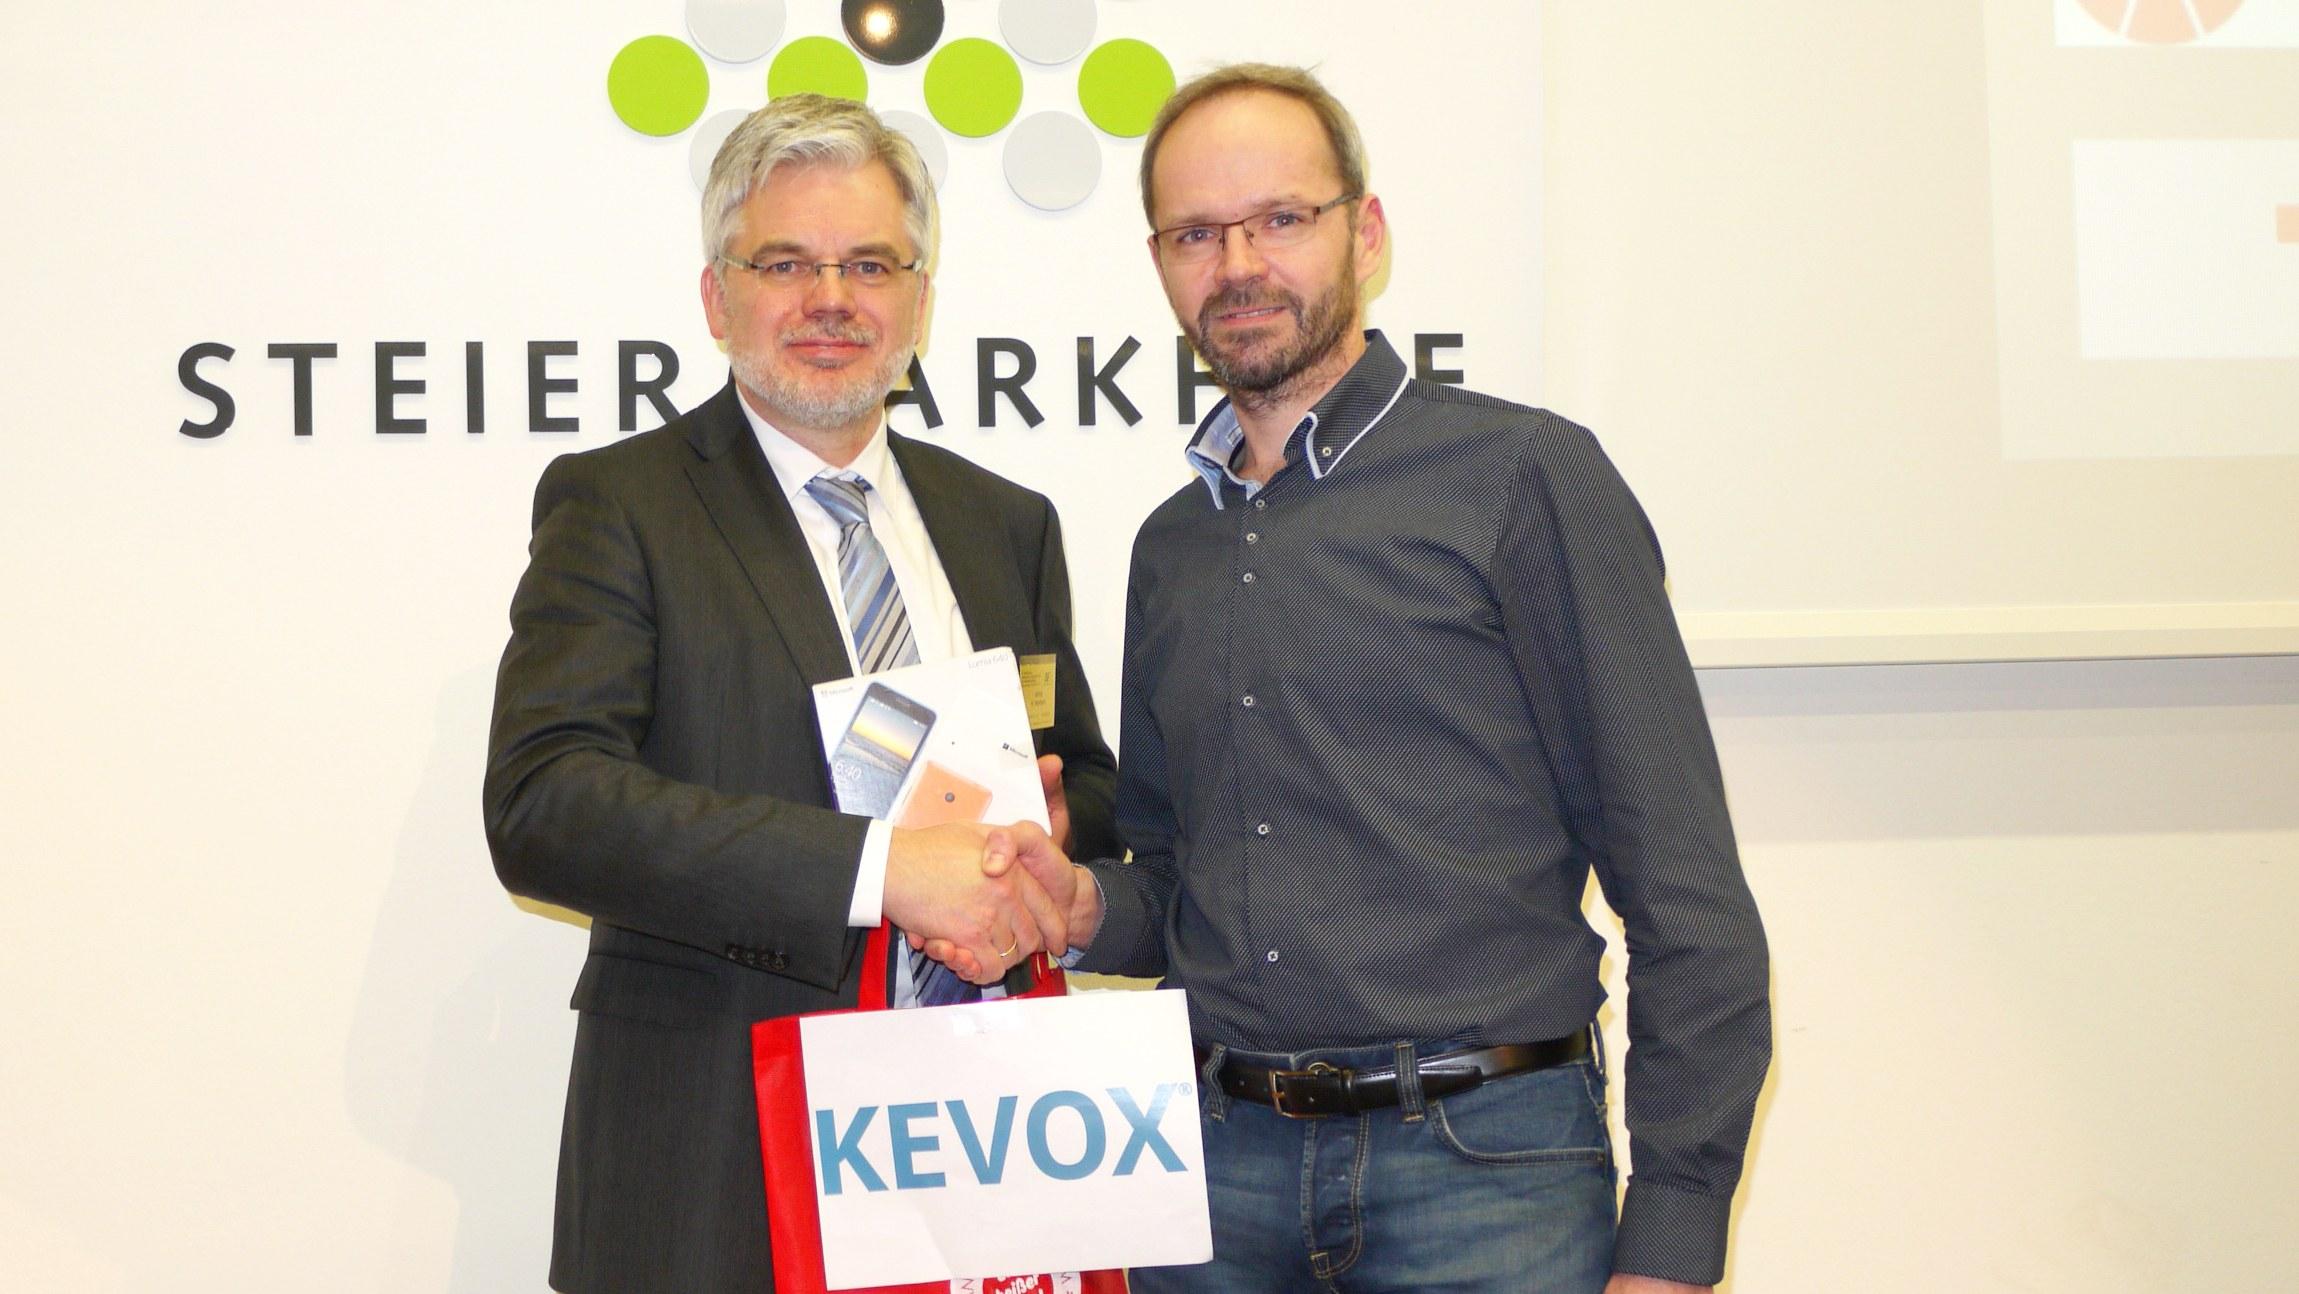 BFA-Aprilsymposion_8.4.16_KEVOX ueberreicht Hauptpreis